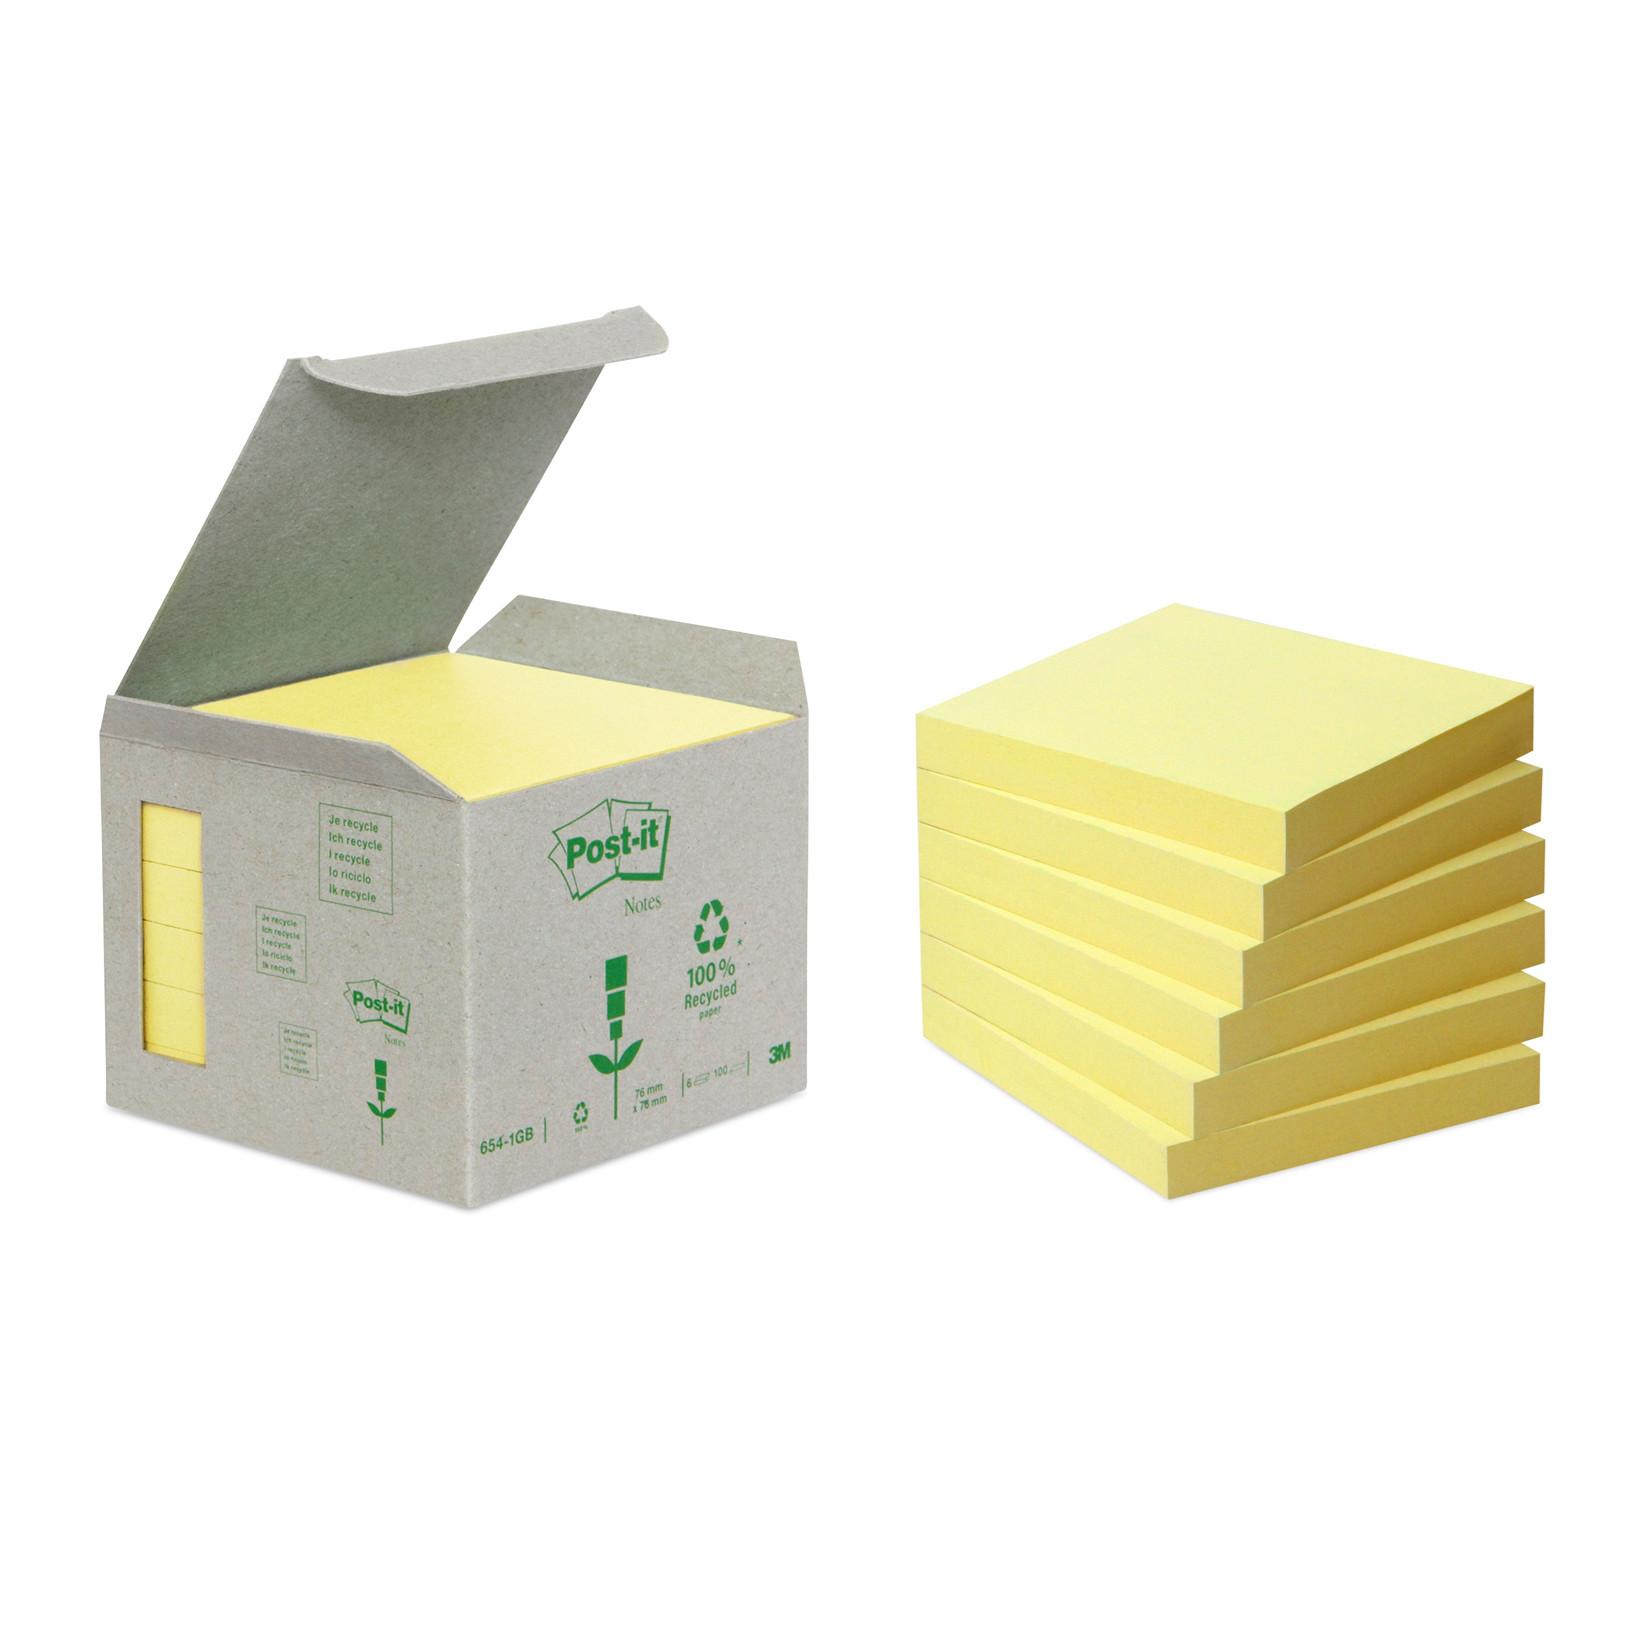 Post-it blokke notes Miljø 76 x 76 mm gul - 6 blokke